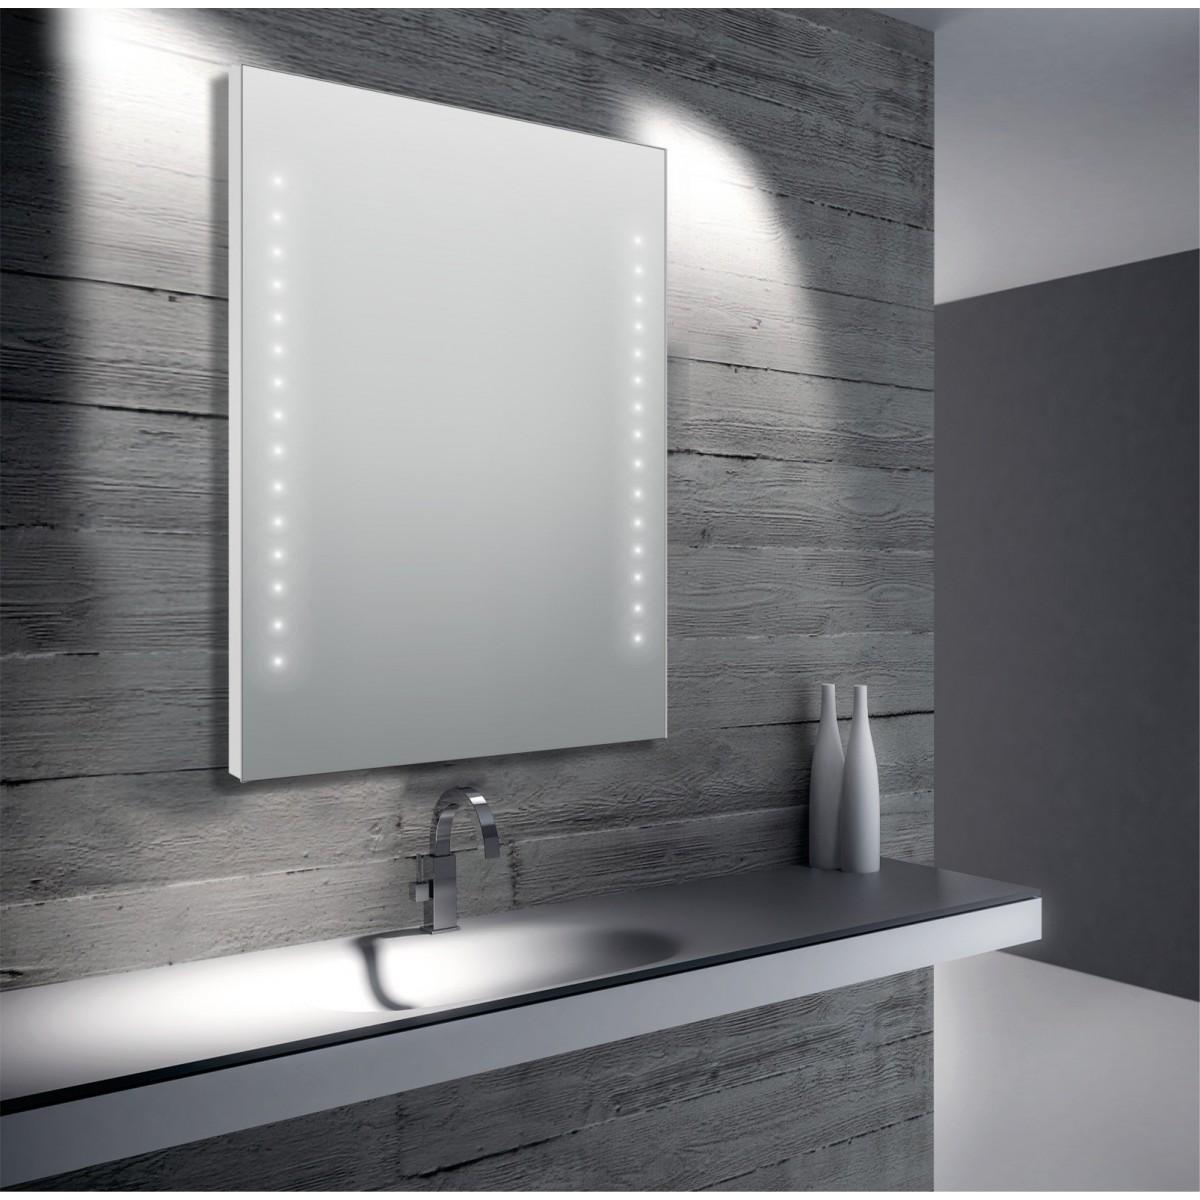 Specchio da bagno led 60x80 o 80x60 giada 68 mondialshop for Specchio da terra ikea